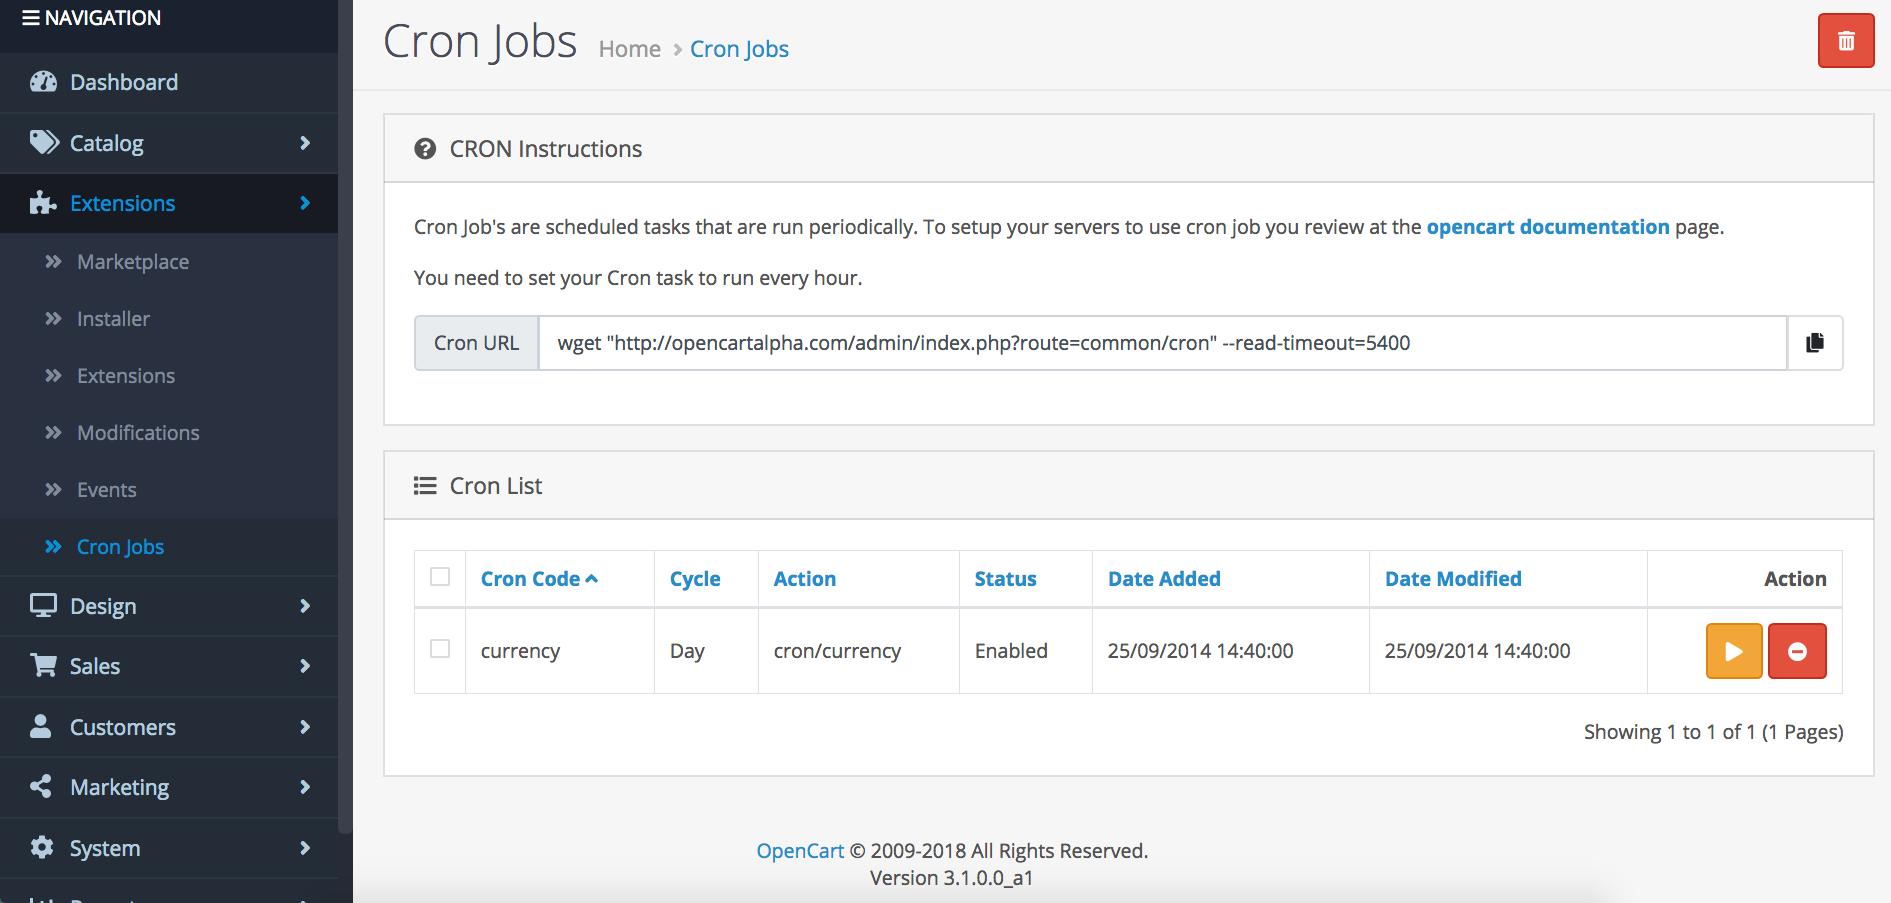 OpenCart 3.1 Cron Jobs